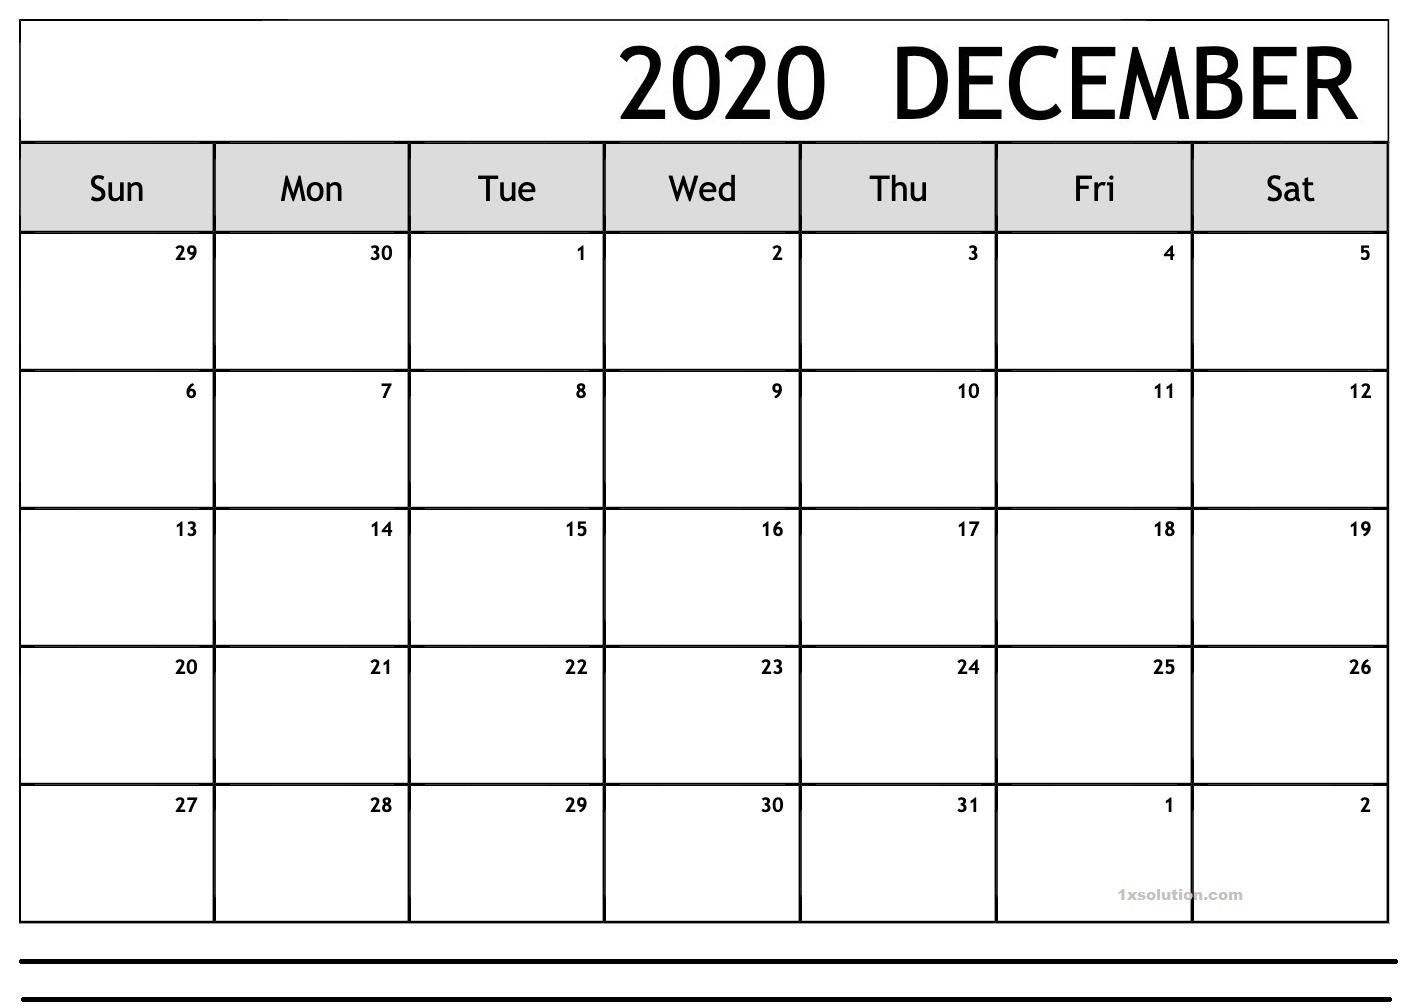 Excel December 2020 Calendar